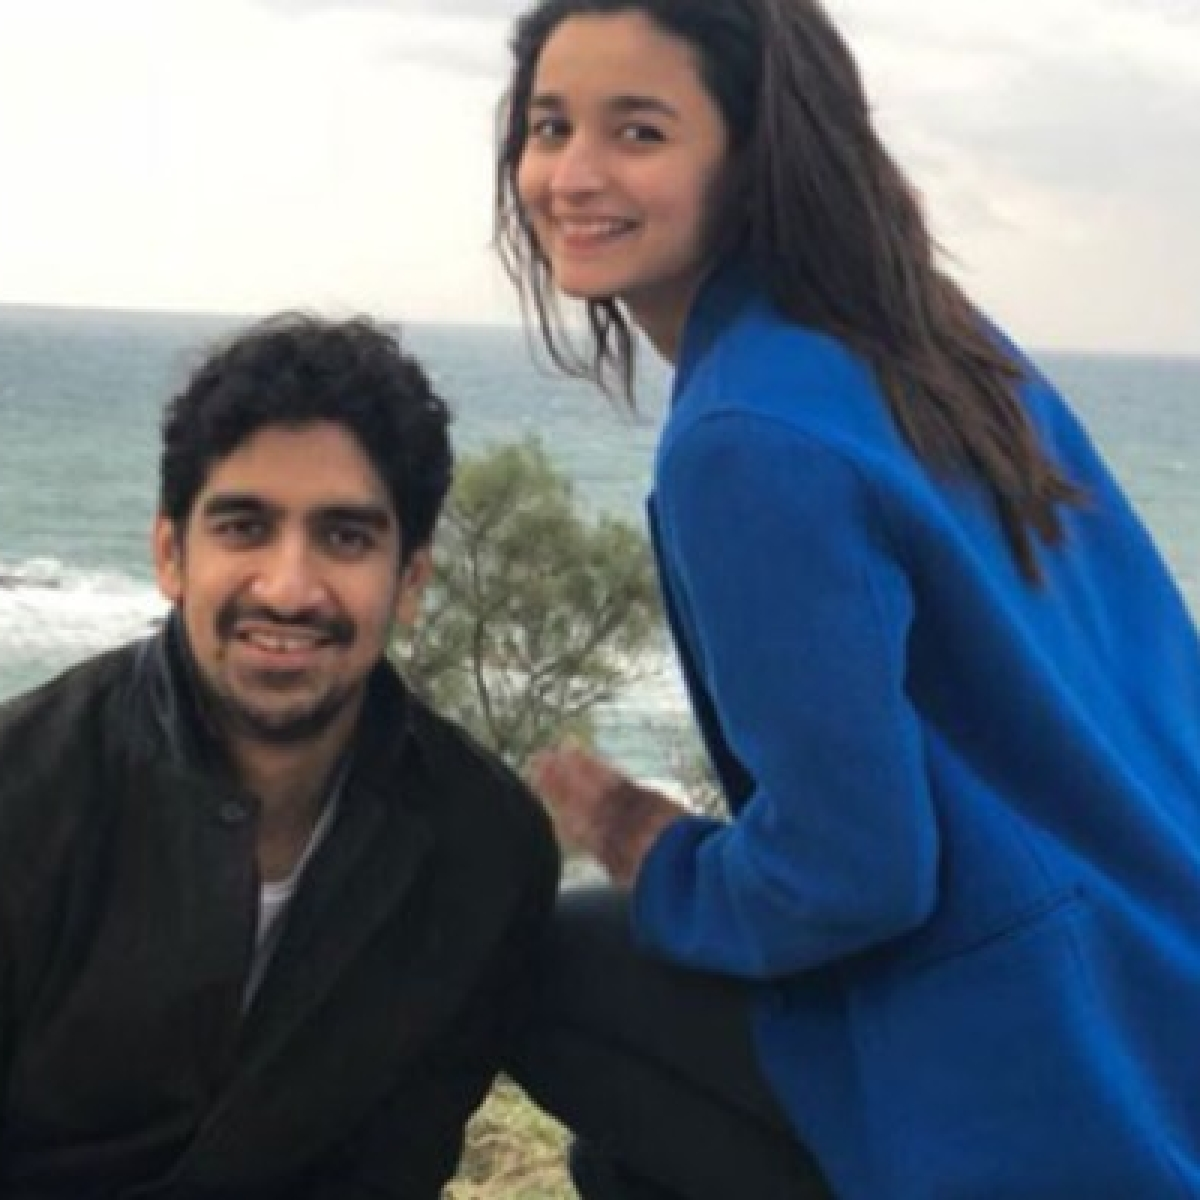 Third wheel for life: Alia Bhatt shares pic of Ayan Mukerji from her baecation with Ranbir Kapoor